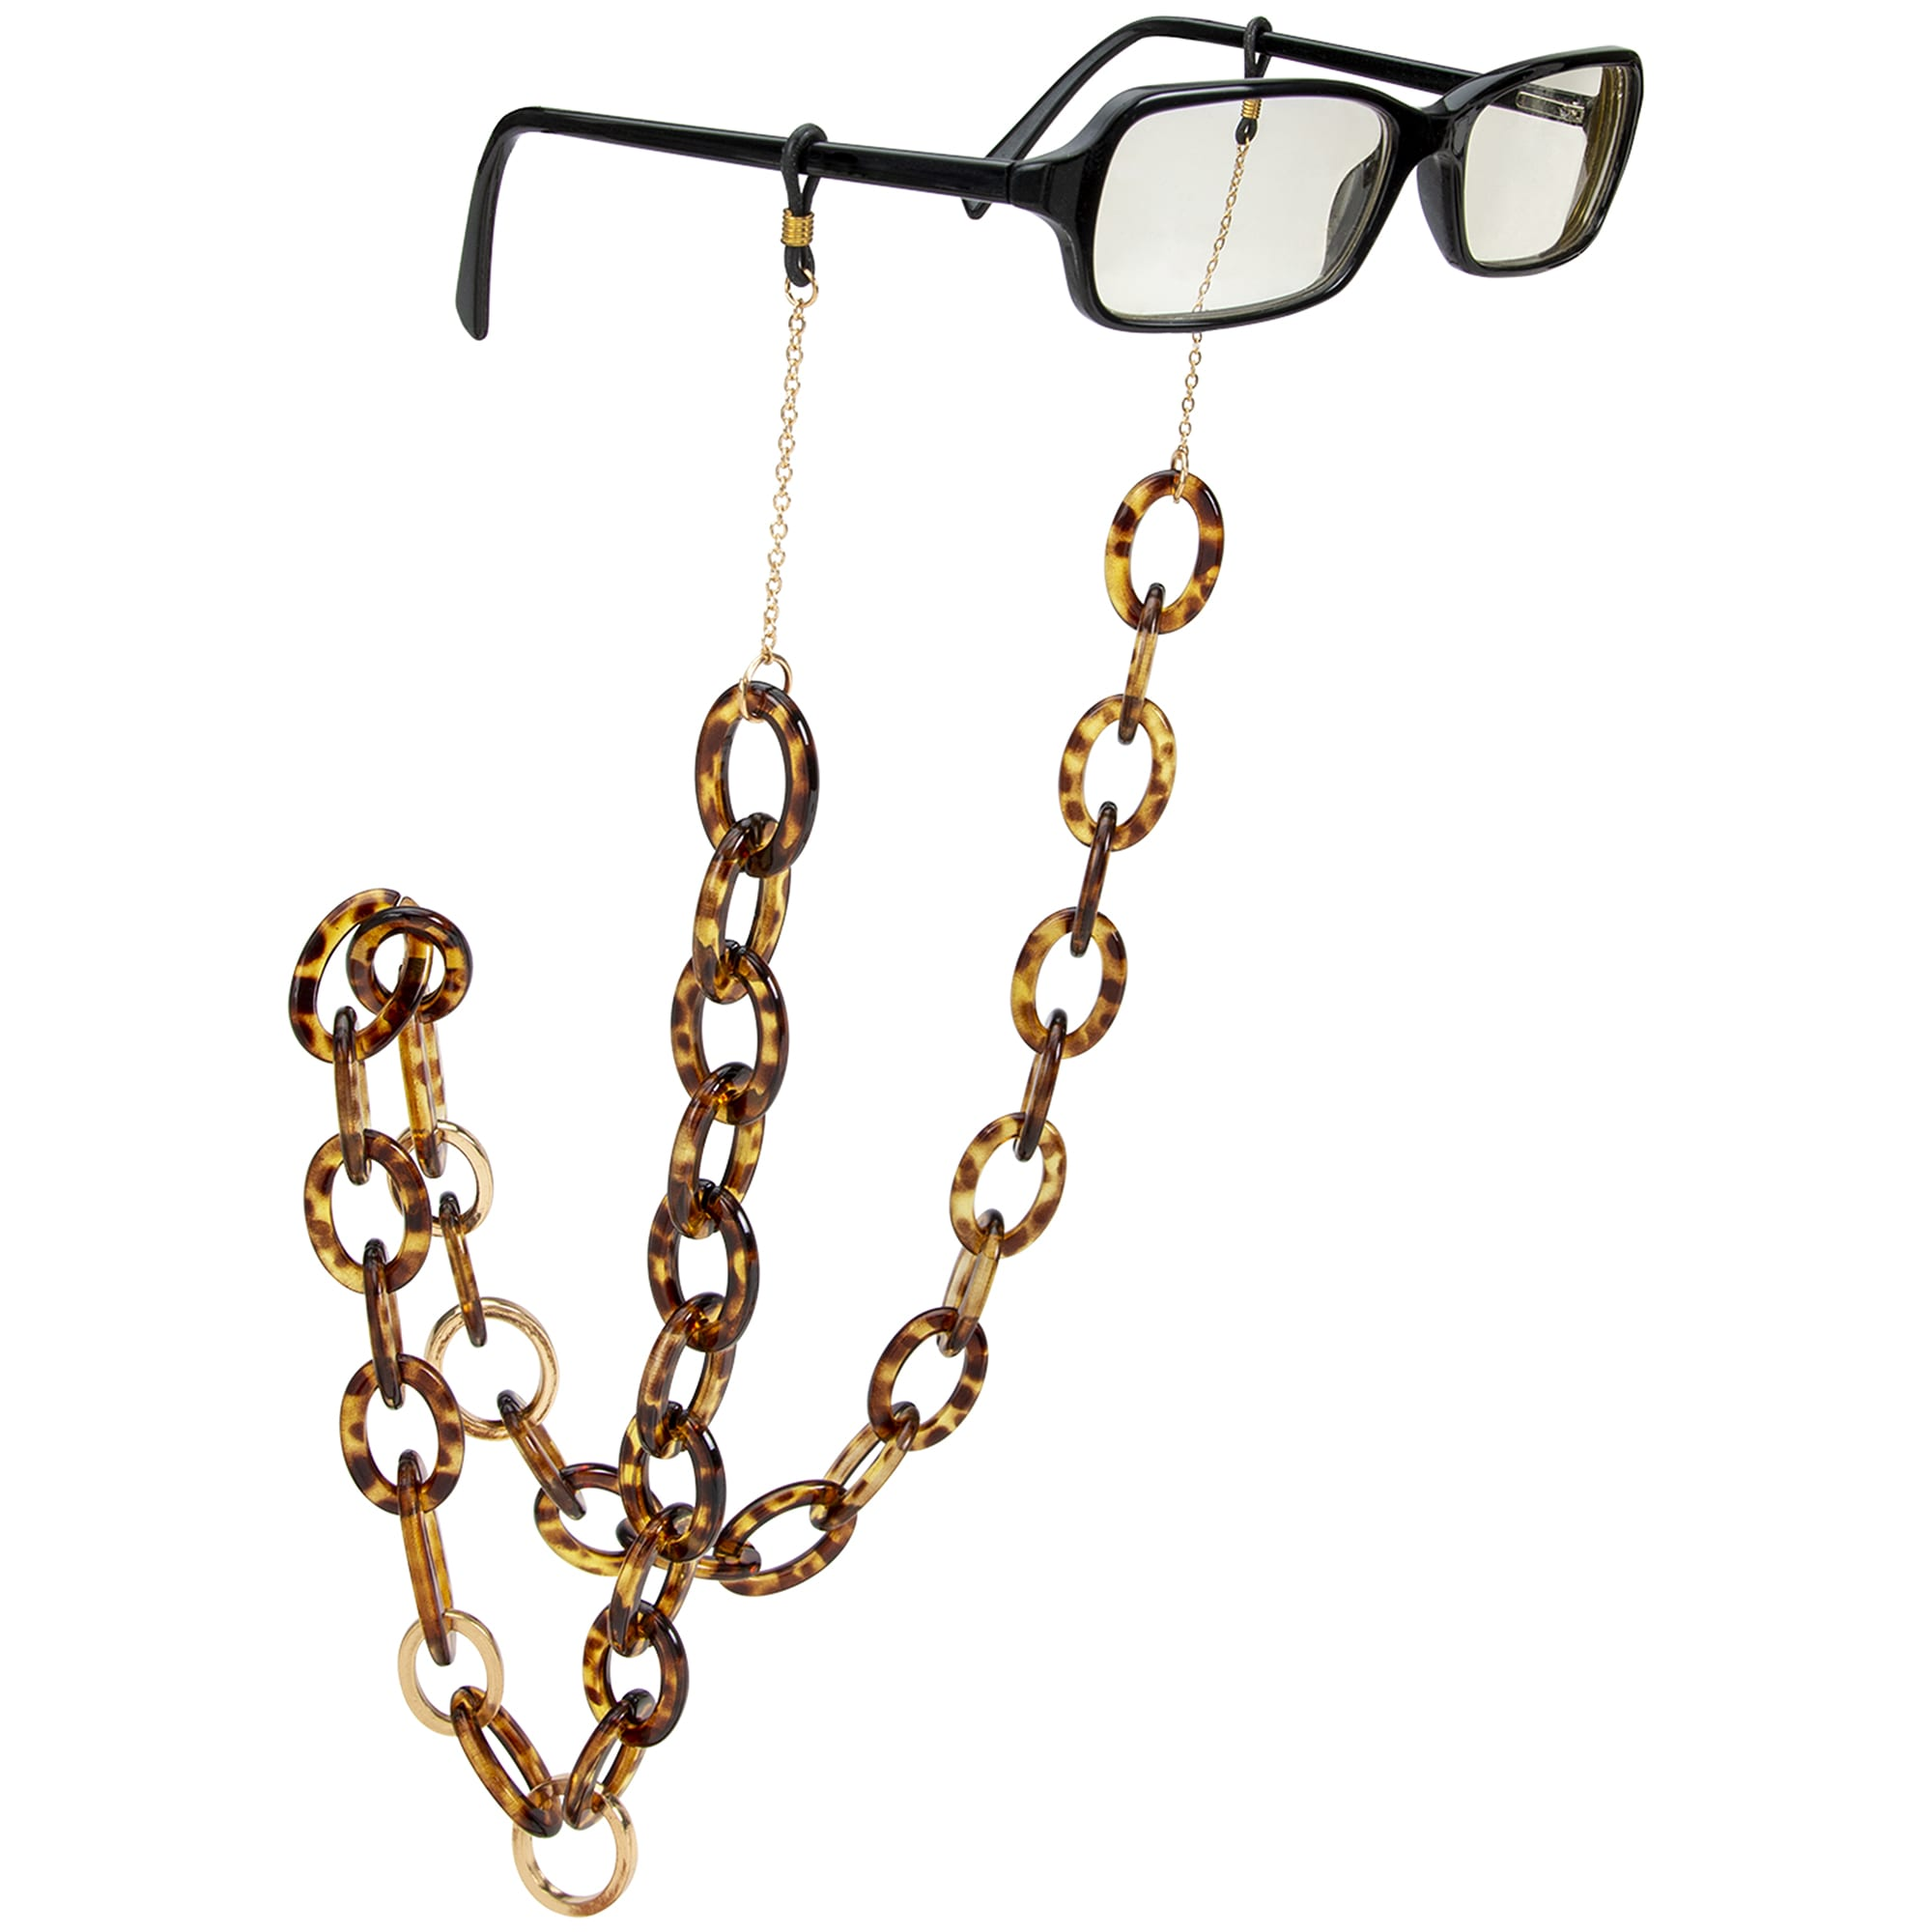 Retro Tortoise and Gold Chain Eyeglass/Sunglass Retainer - Tortoise - Front